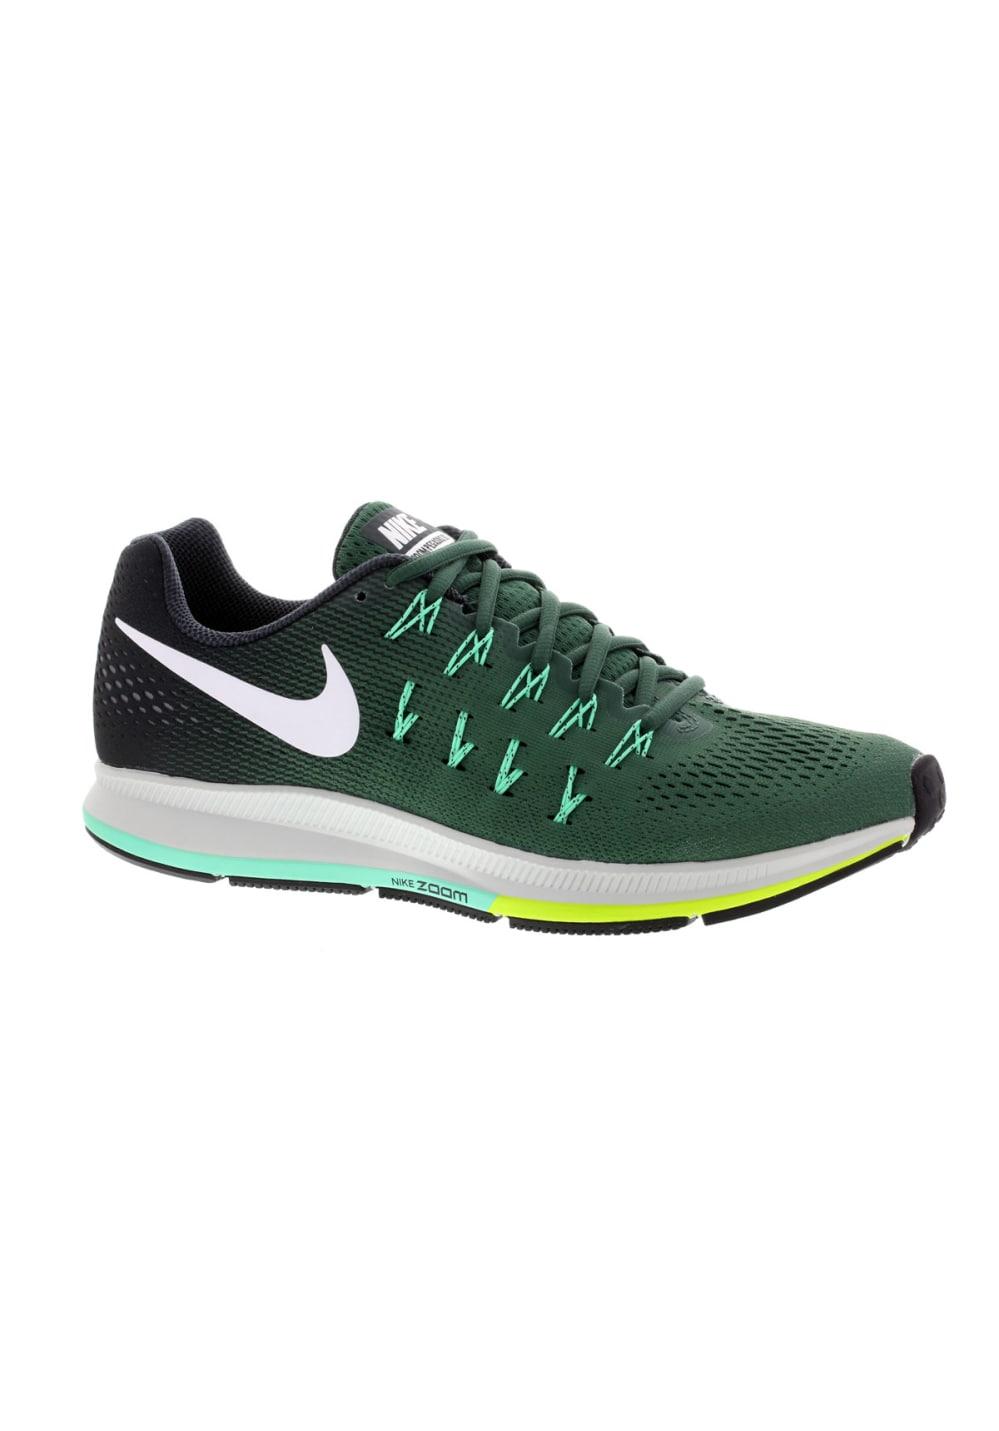 on sale df3c6 24b1c Next. Nike. Air Zoom Pegasus 33 ...